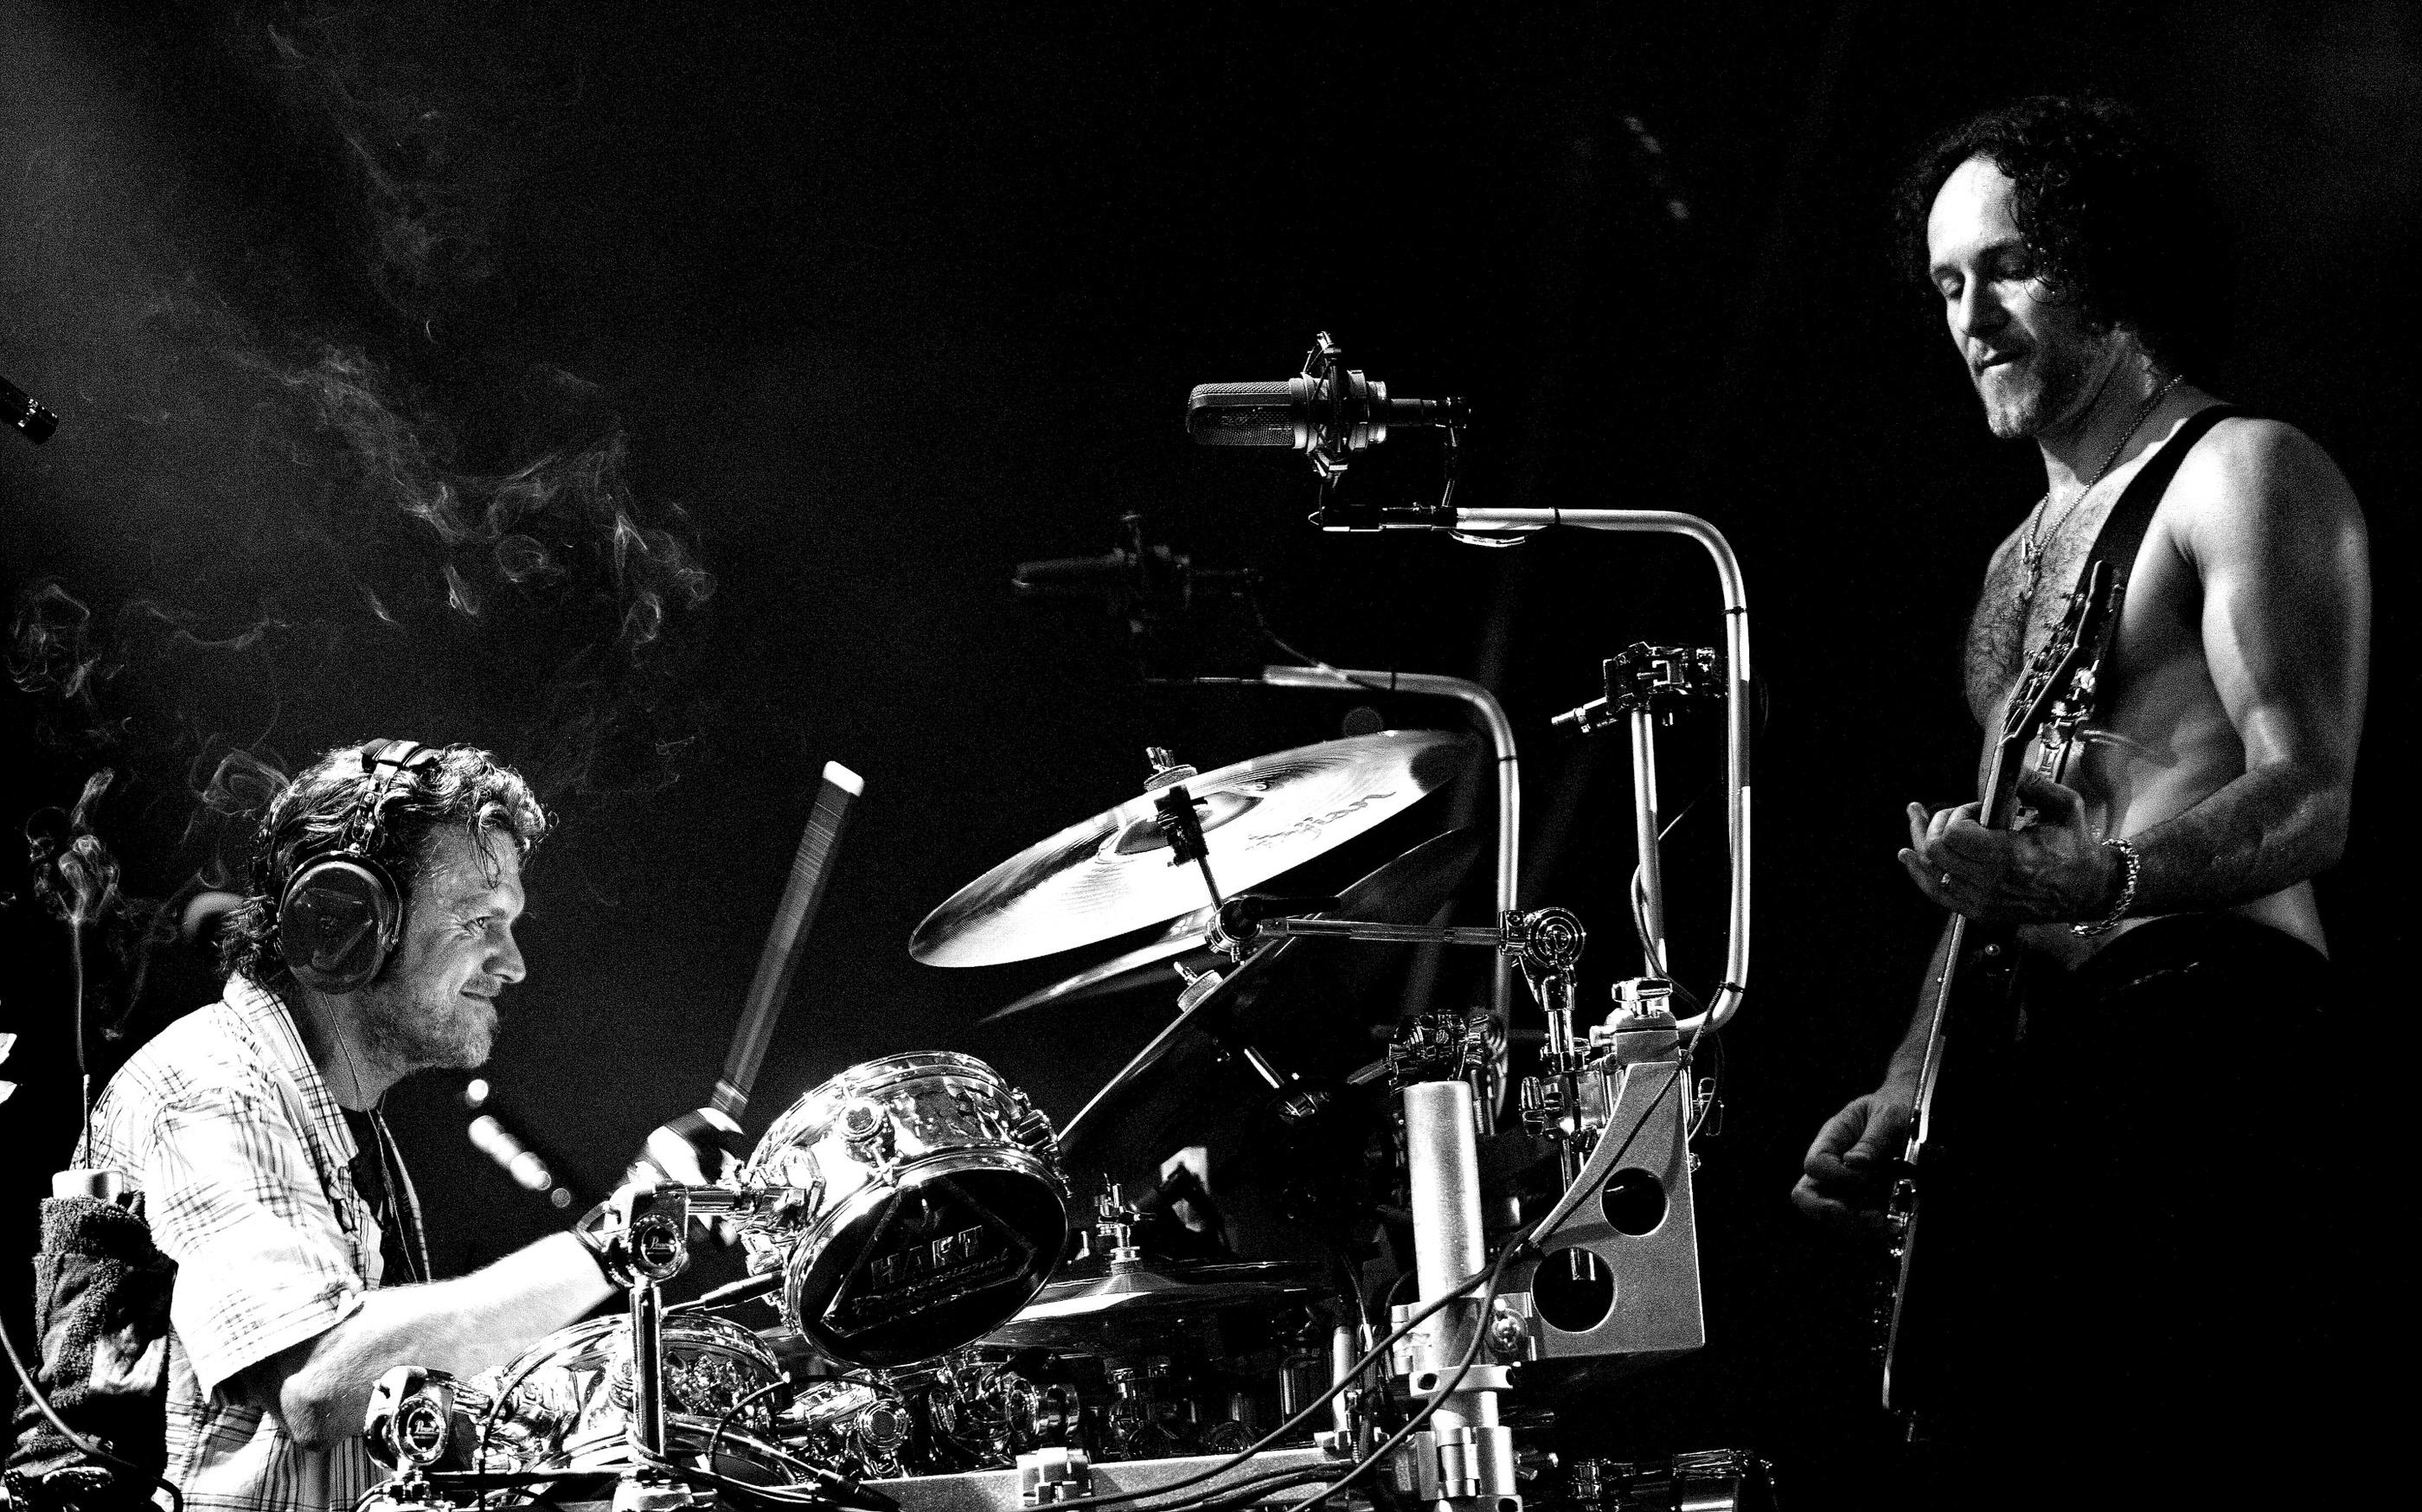 Rick Allen and Vivian Campbell Def Leppard Belfast 2008 by Ash N